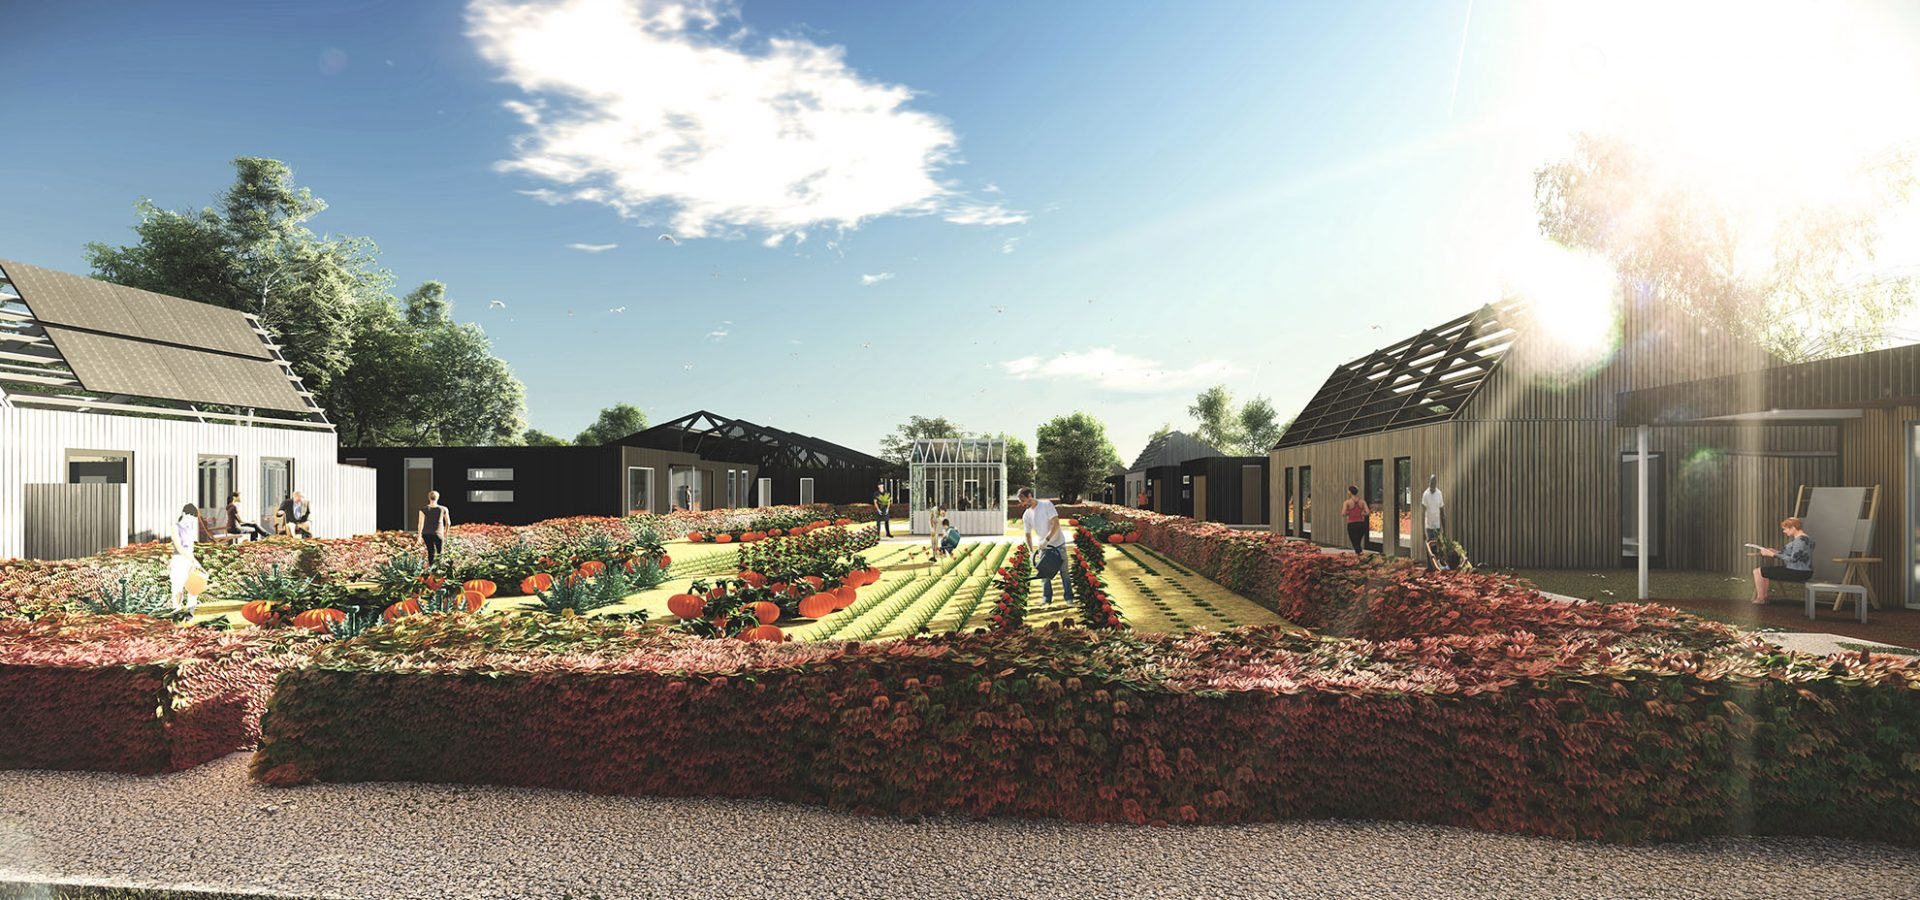 FARO architecten Buurtskap de Tuunen Texel 05